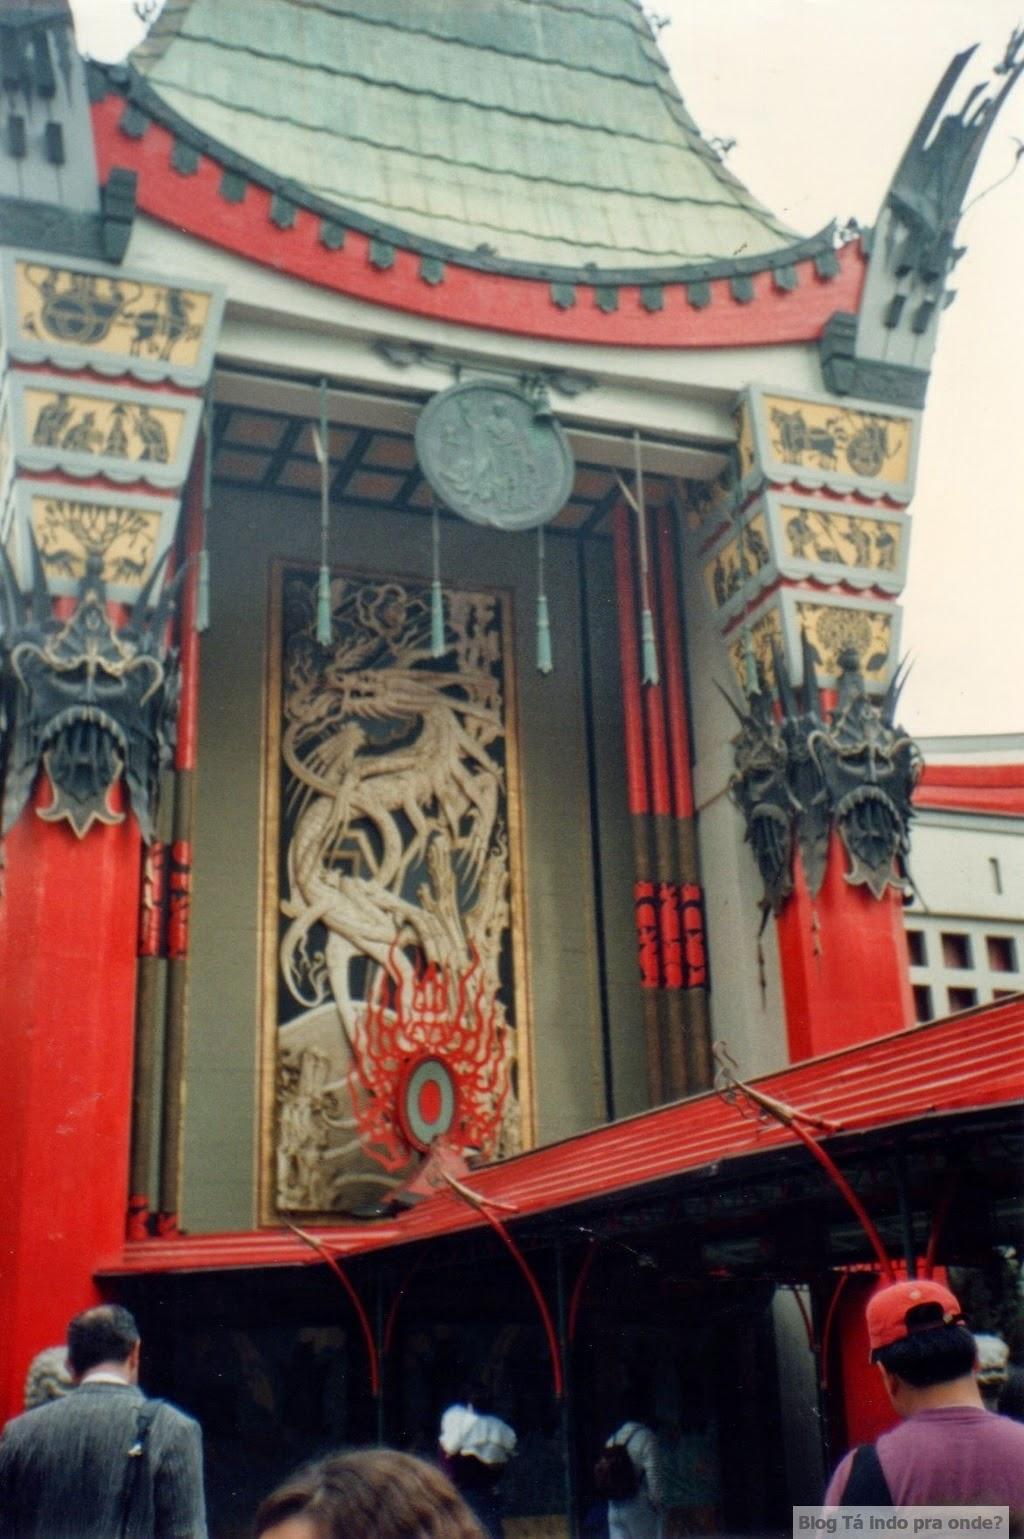 teatro chinês em Los Angeles